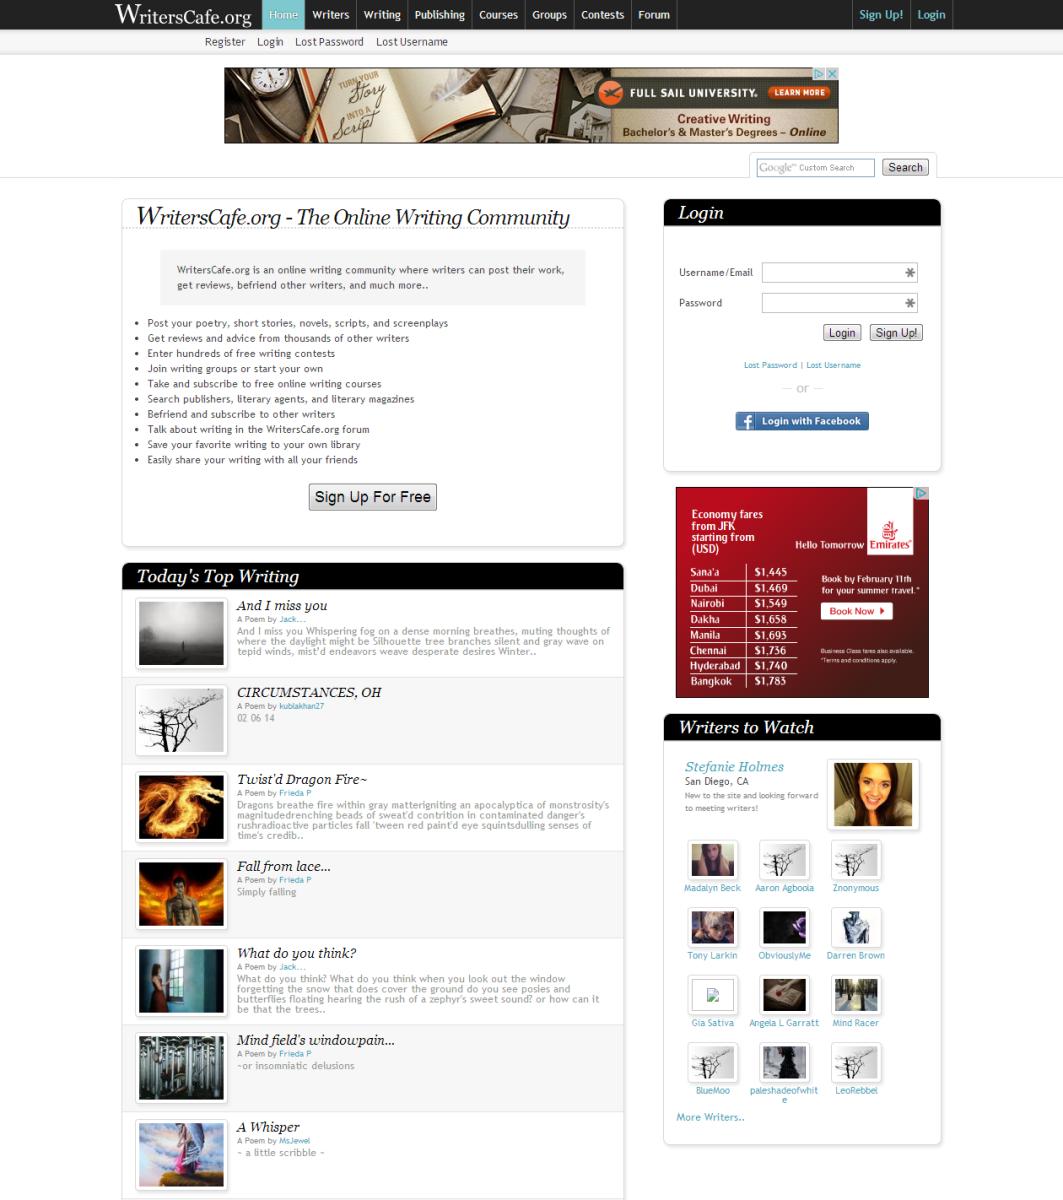 Screenshot of Writer's Cafe Homepage